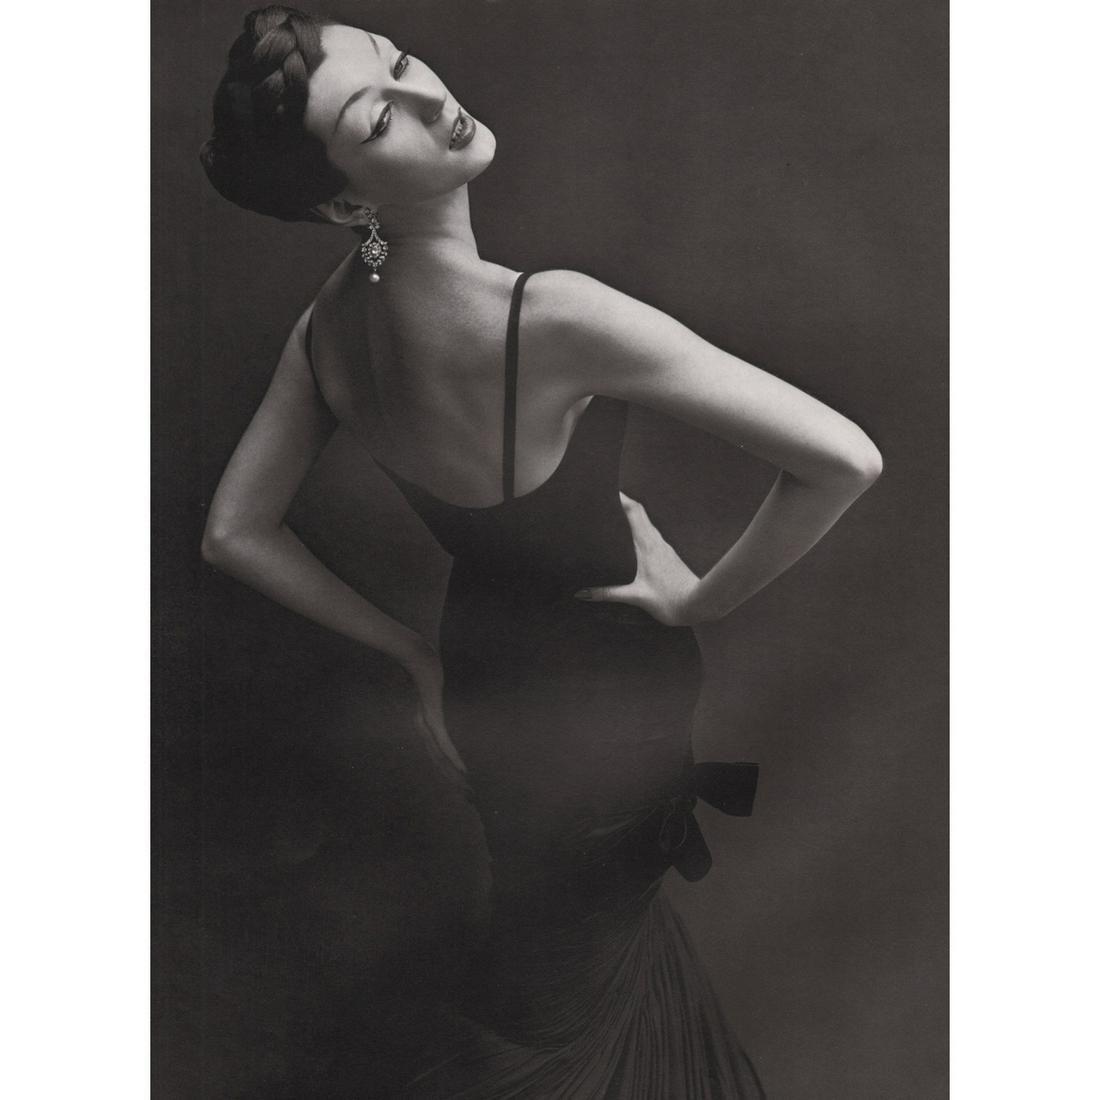 RICHARD AVEDON - Dovima, Dress by Griffe, 1955